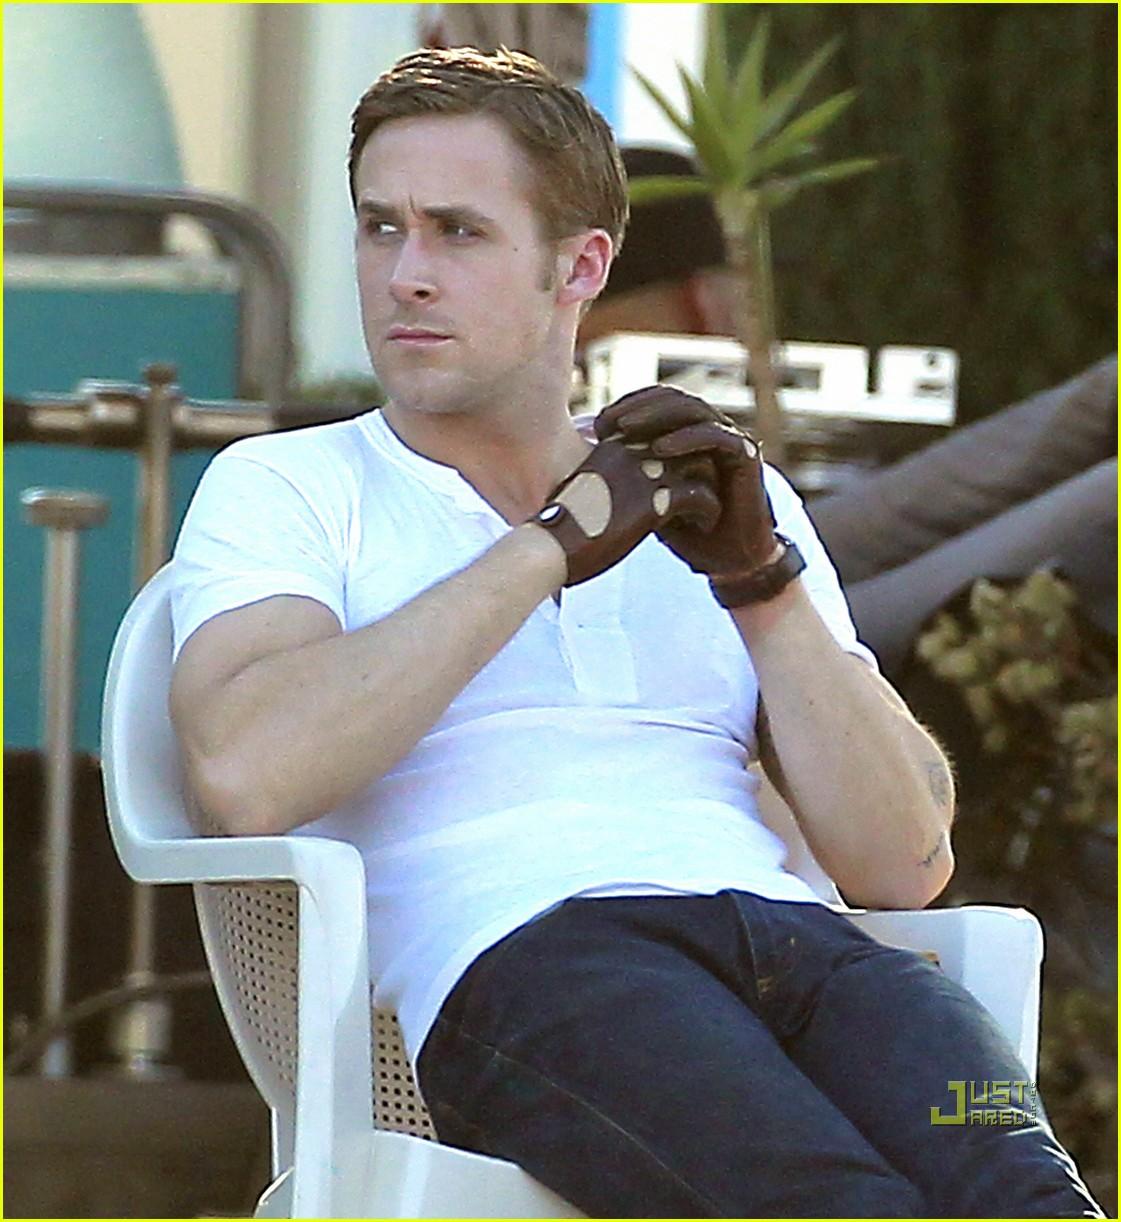 Driving gloves like ryan gosling - Ryan Gosling Christina Hendricks Drive Into The Desert Photo 2483433 Christina Hendricks Ryan Gosling Pictures Just Jared